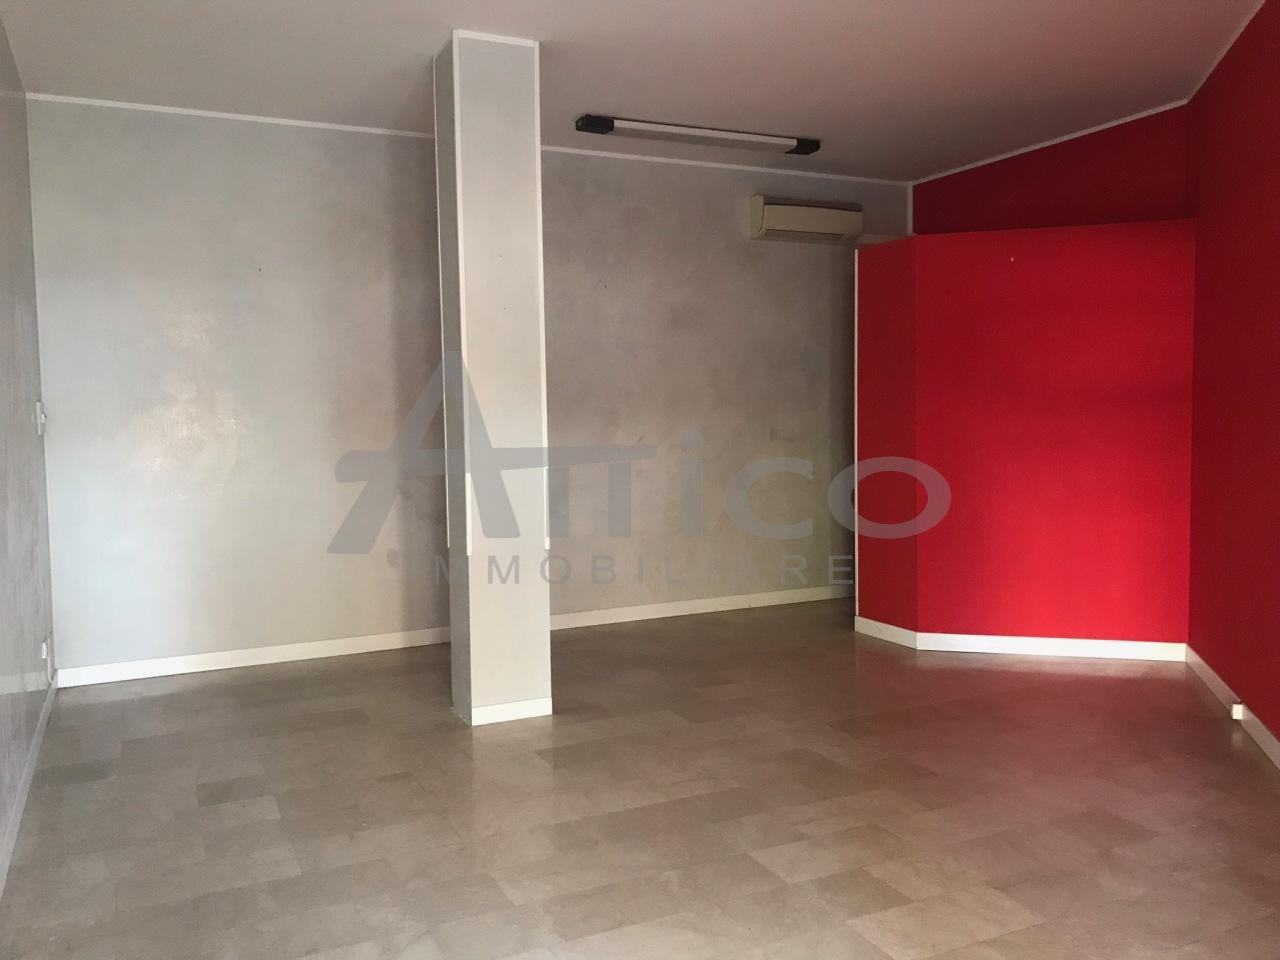 Locale commerciale - 1 Vetrina a Commenda Est, Rovigo Rif. 4169469